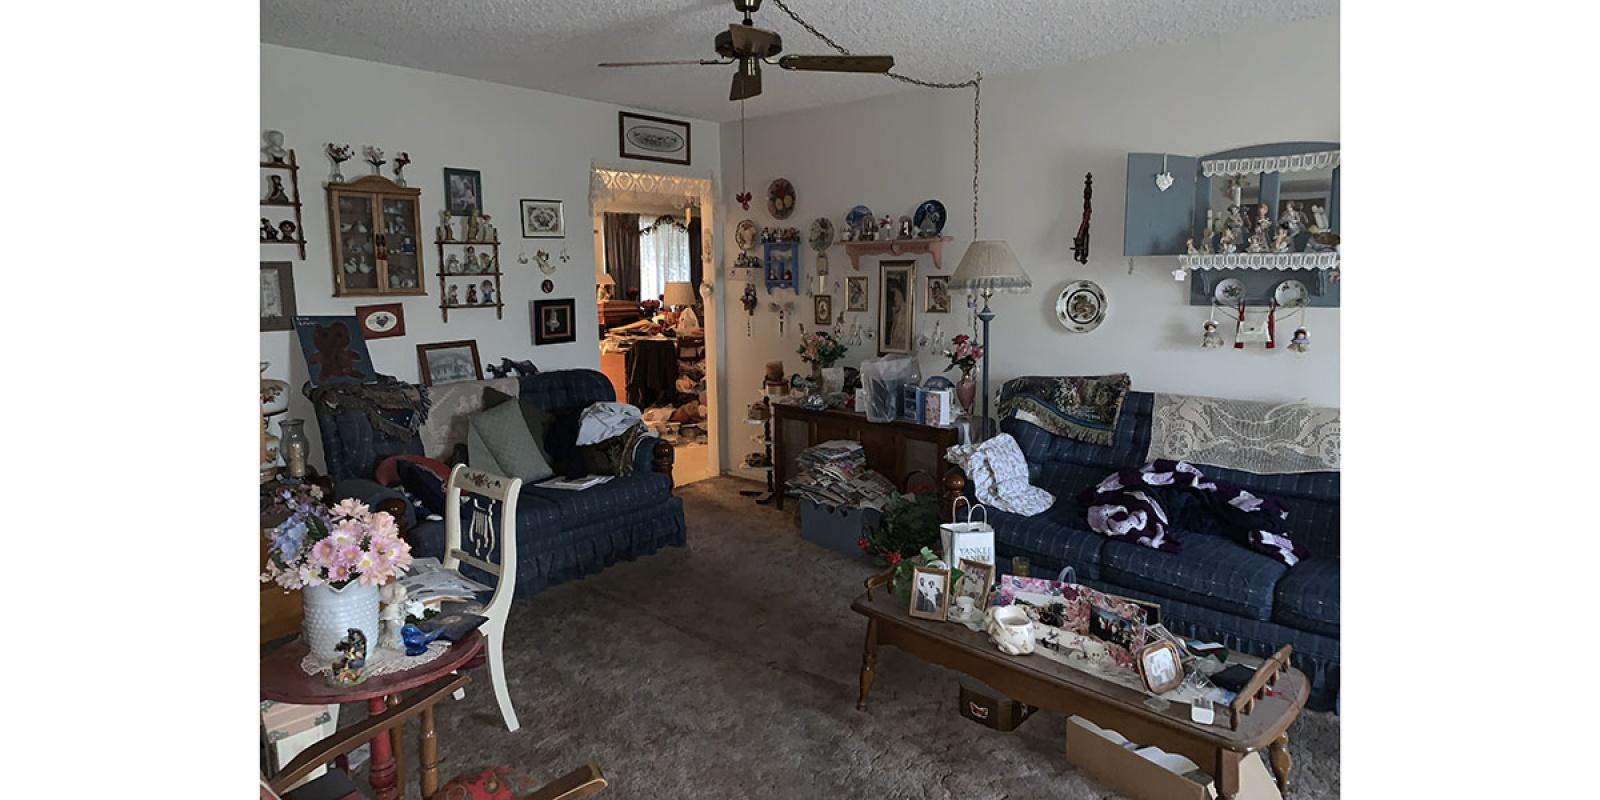 2949 E Cortez St, Phoenix, Arizona 85028, 4 Bedrooms Bedrooms, ,2 BathroomsBathrooms,SFR,Sold,E Cortez St,1155